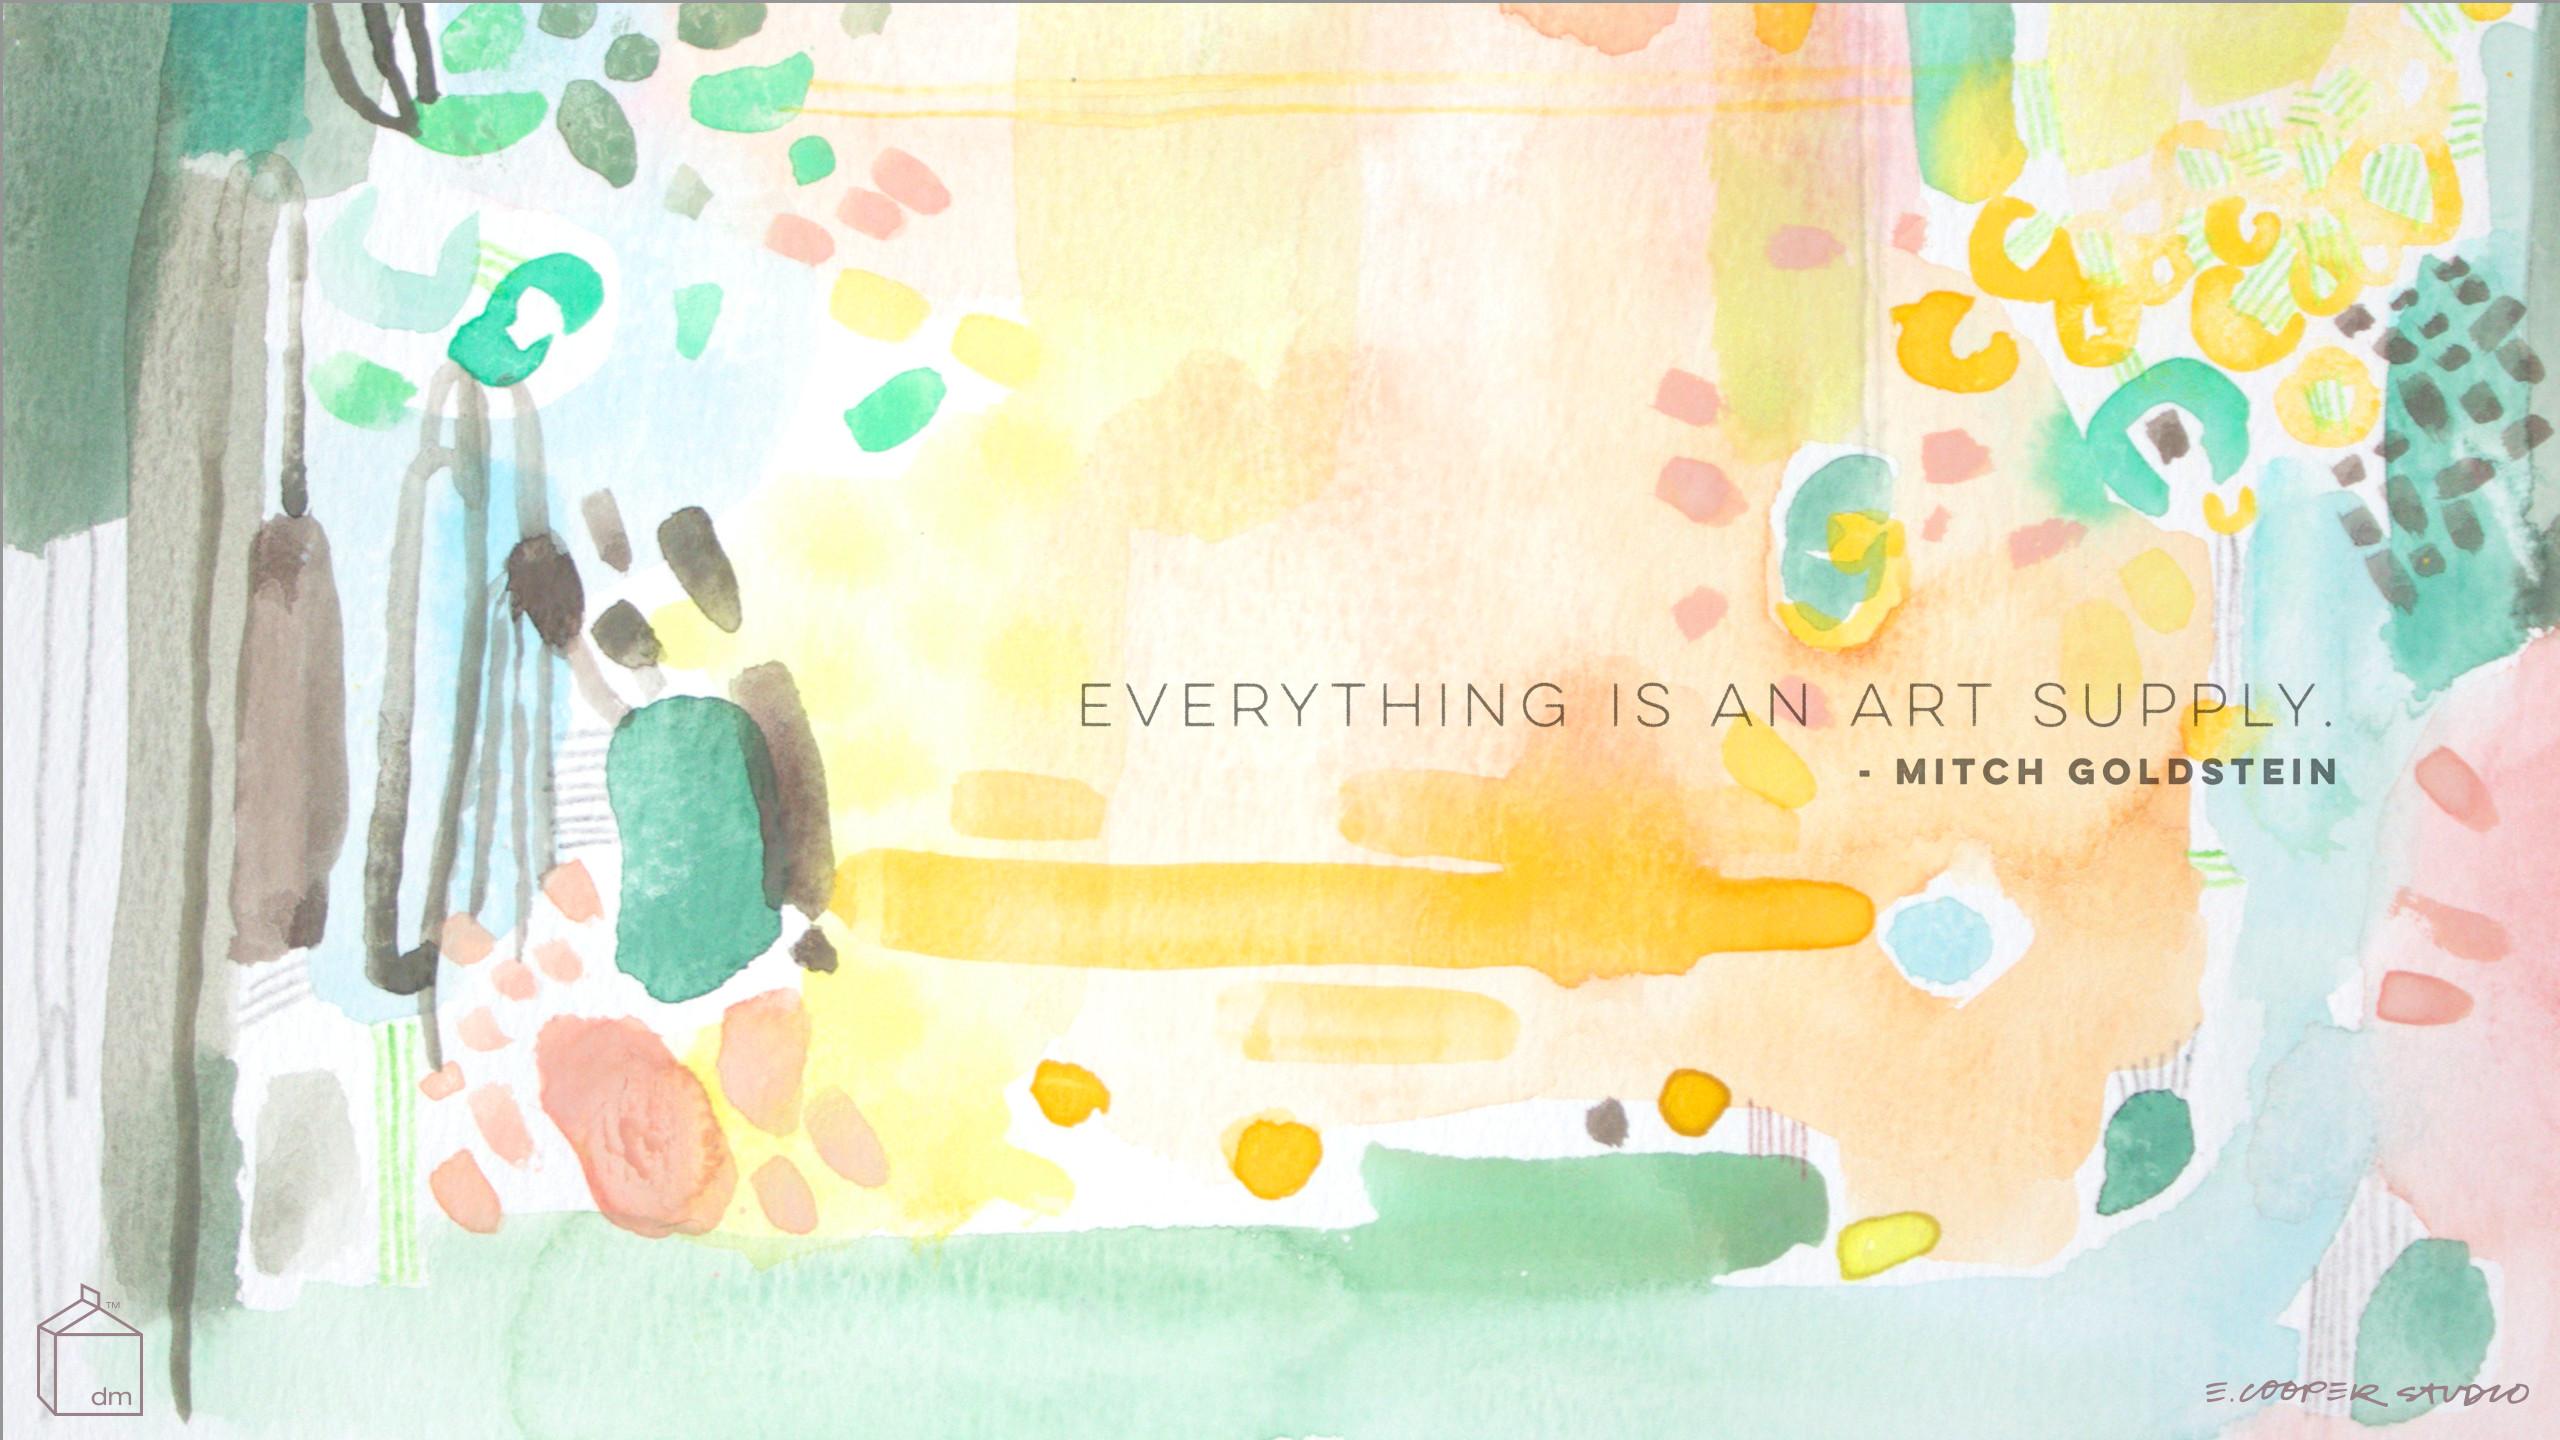 Girl Wallpaper For Iphone 6 Plus Abstract Painting Desktop Wallpaper Illustration Design Milk